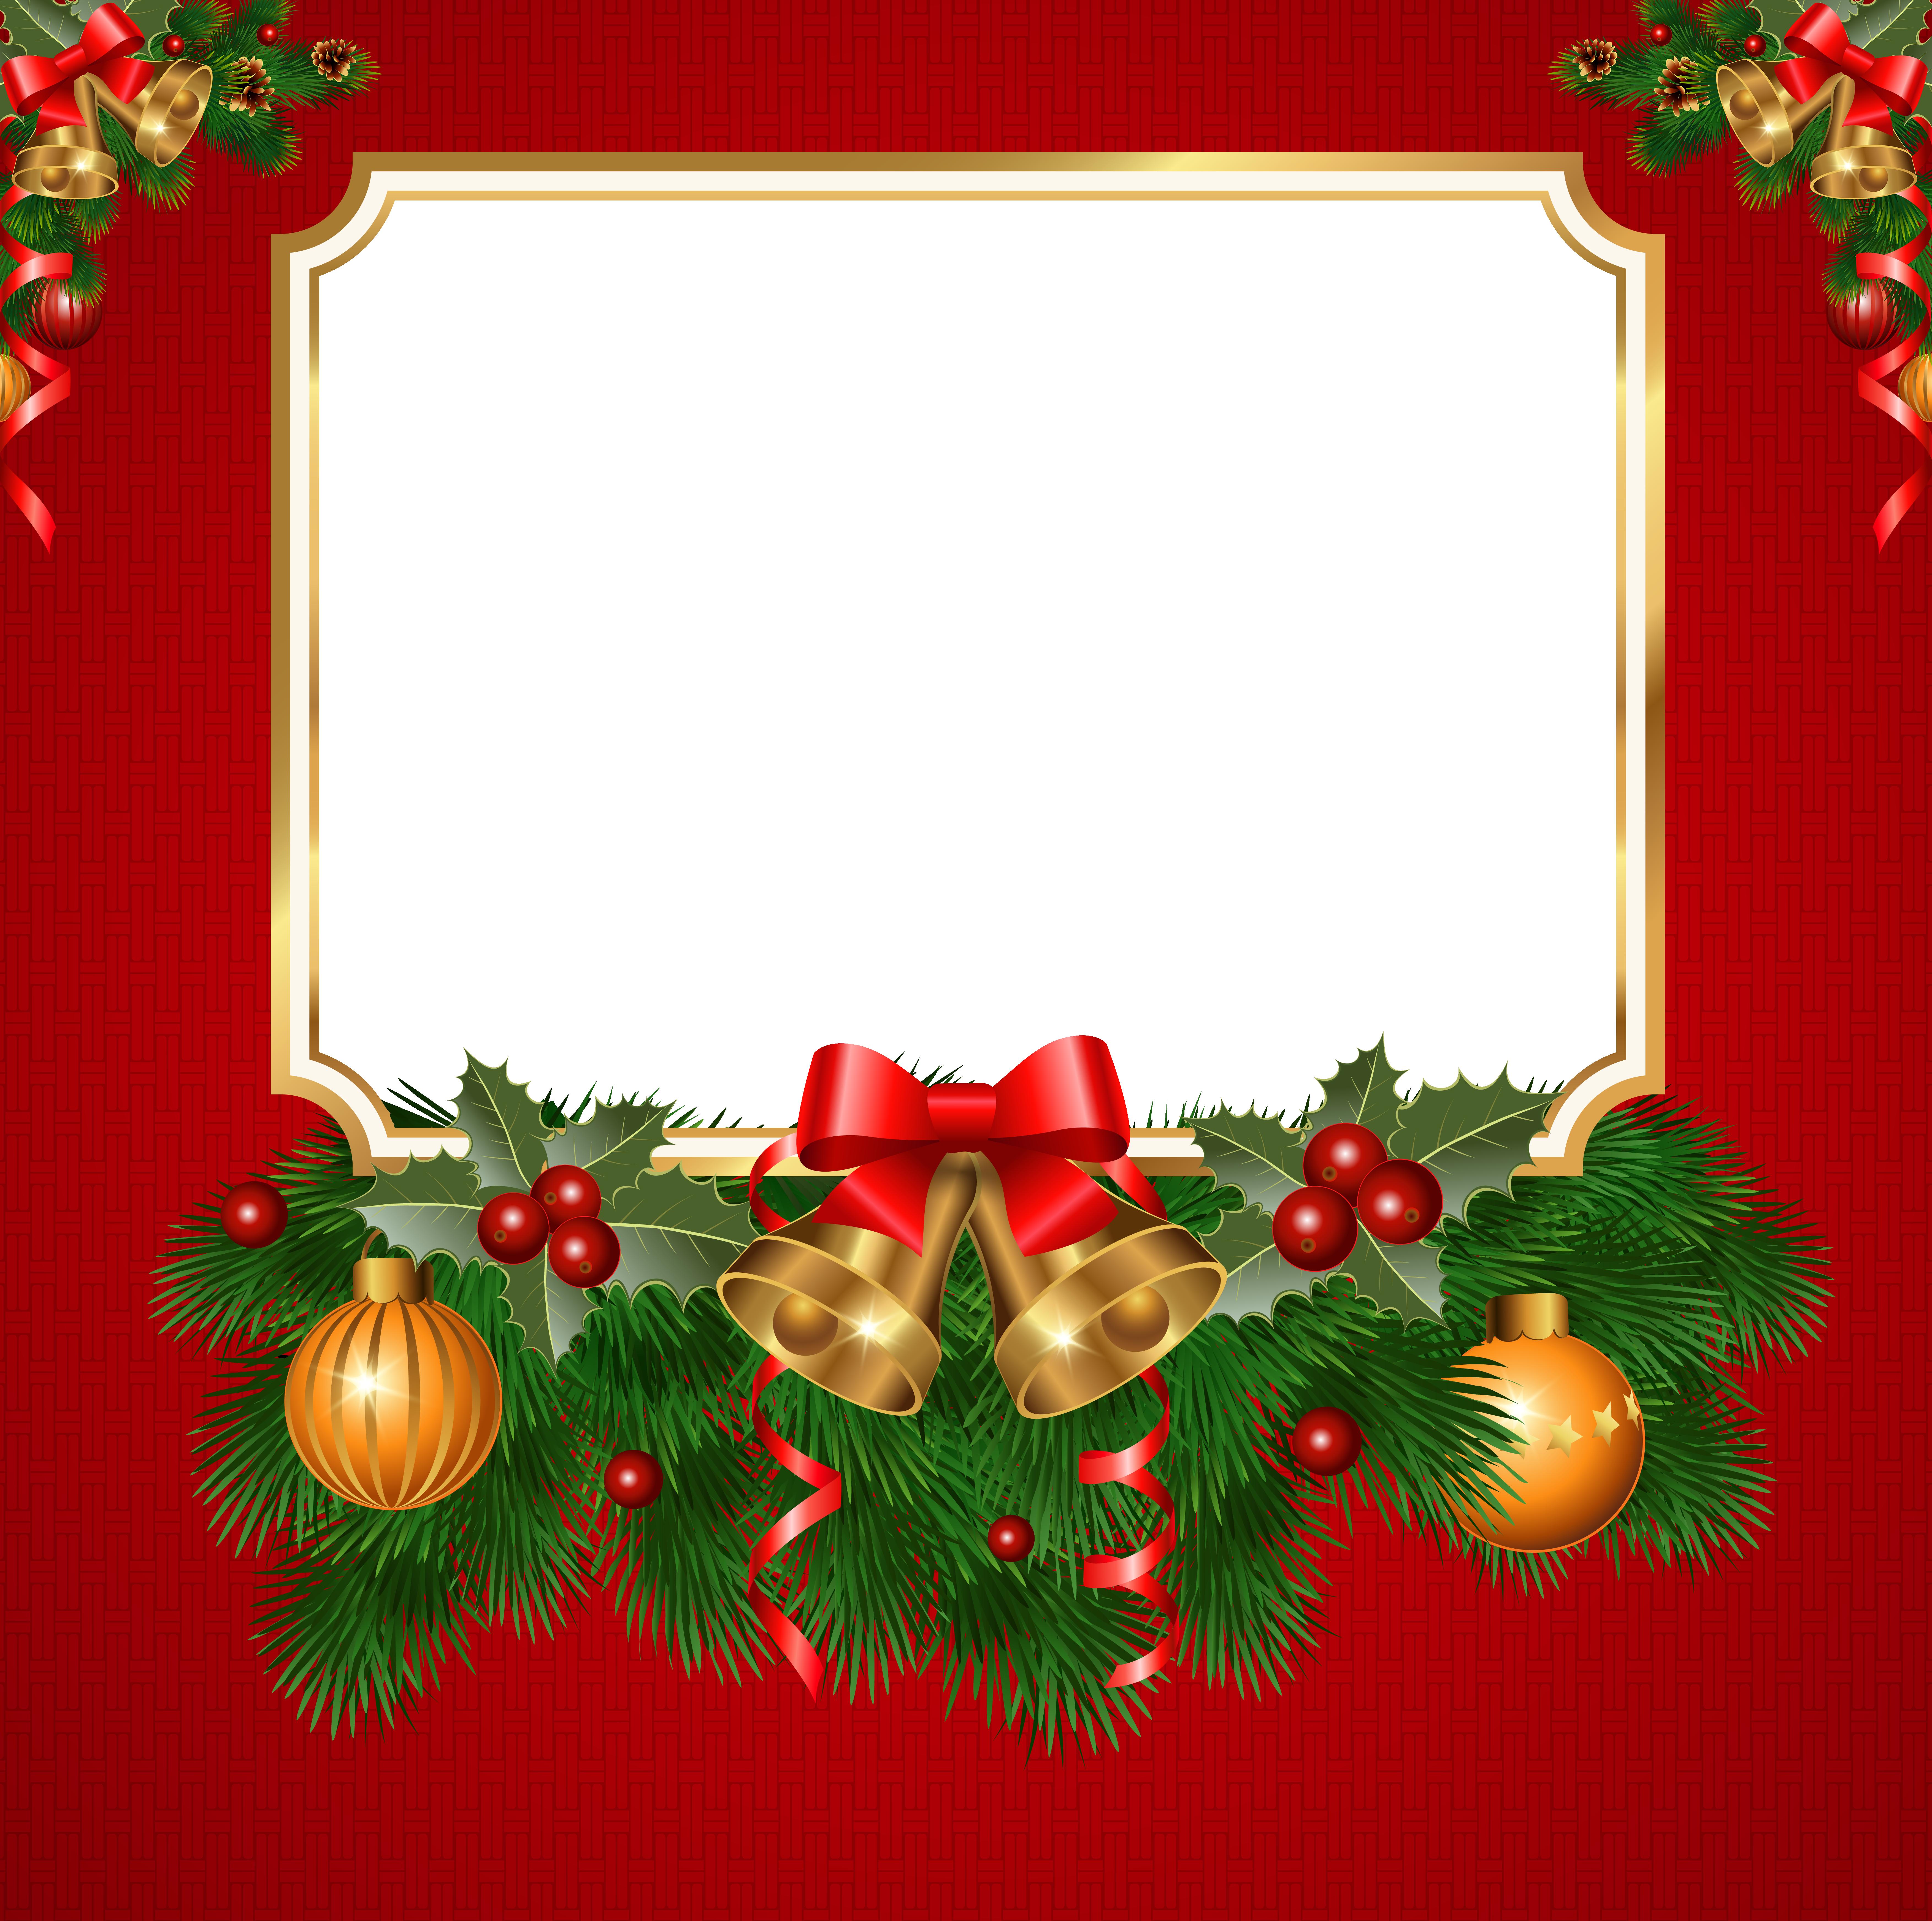 Christmas Transparent Red PNG Frame | Christmas | Pinterest ...